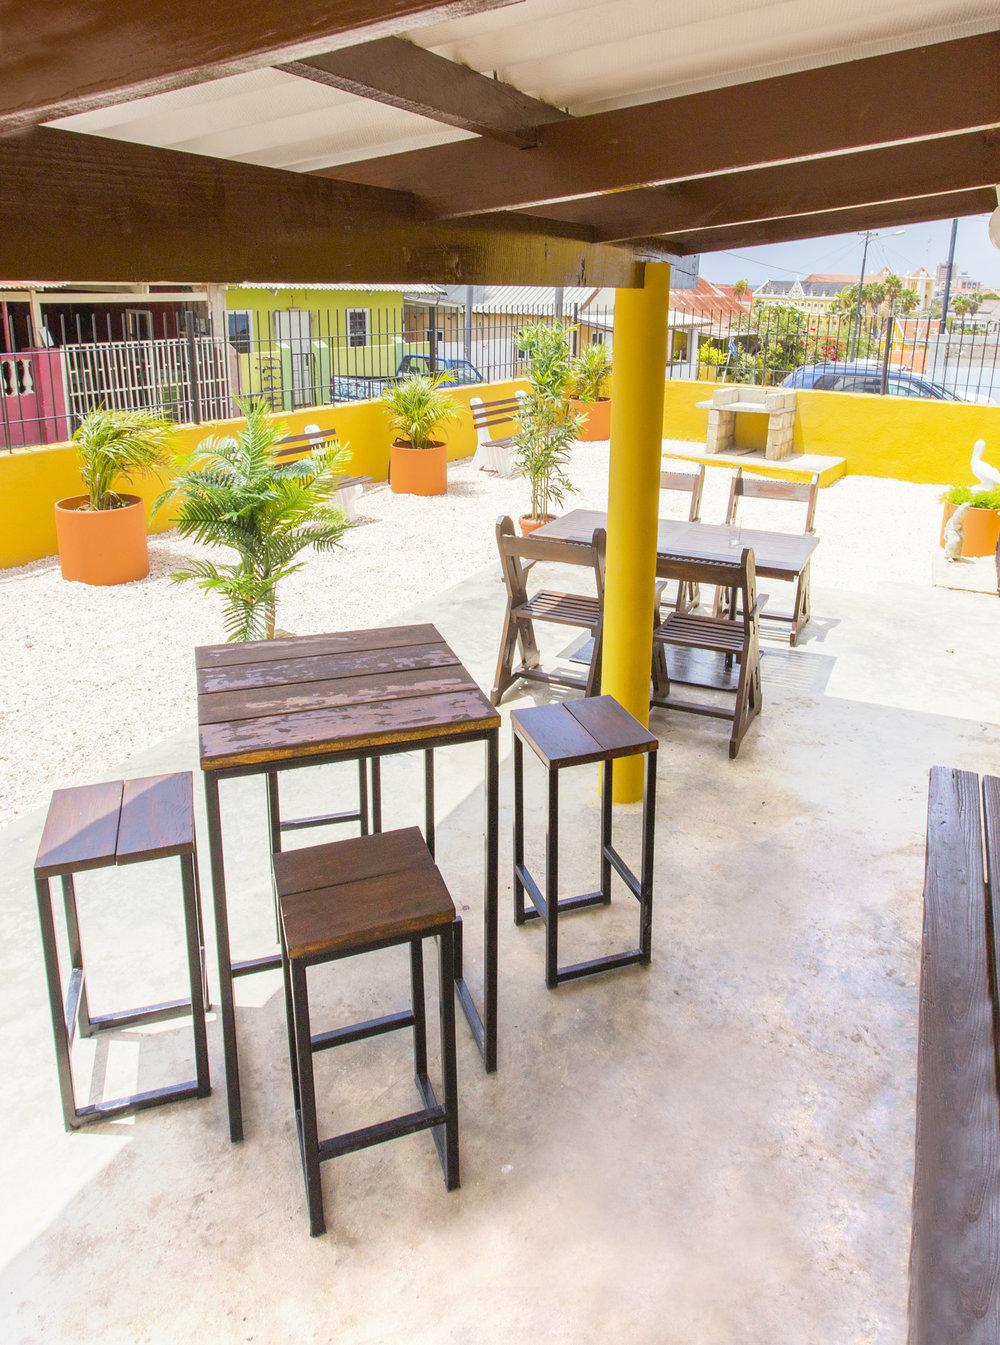 StageDesk-Curaçao-Stagehuis-BergAltena-Pelikaan-huis08.jpg